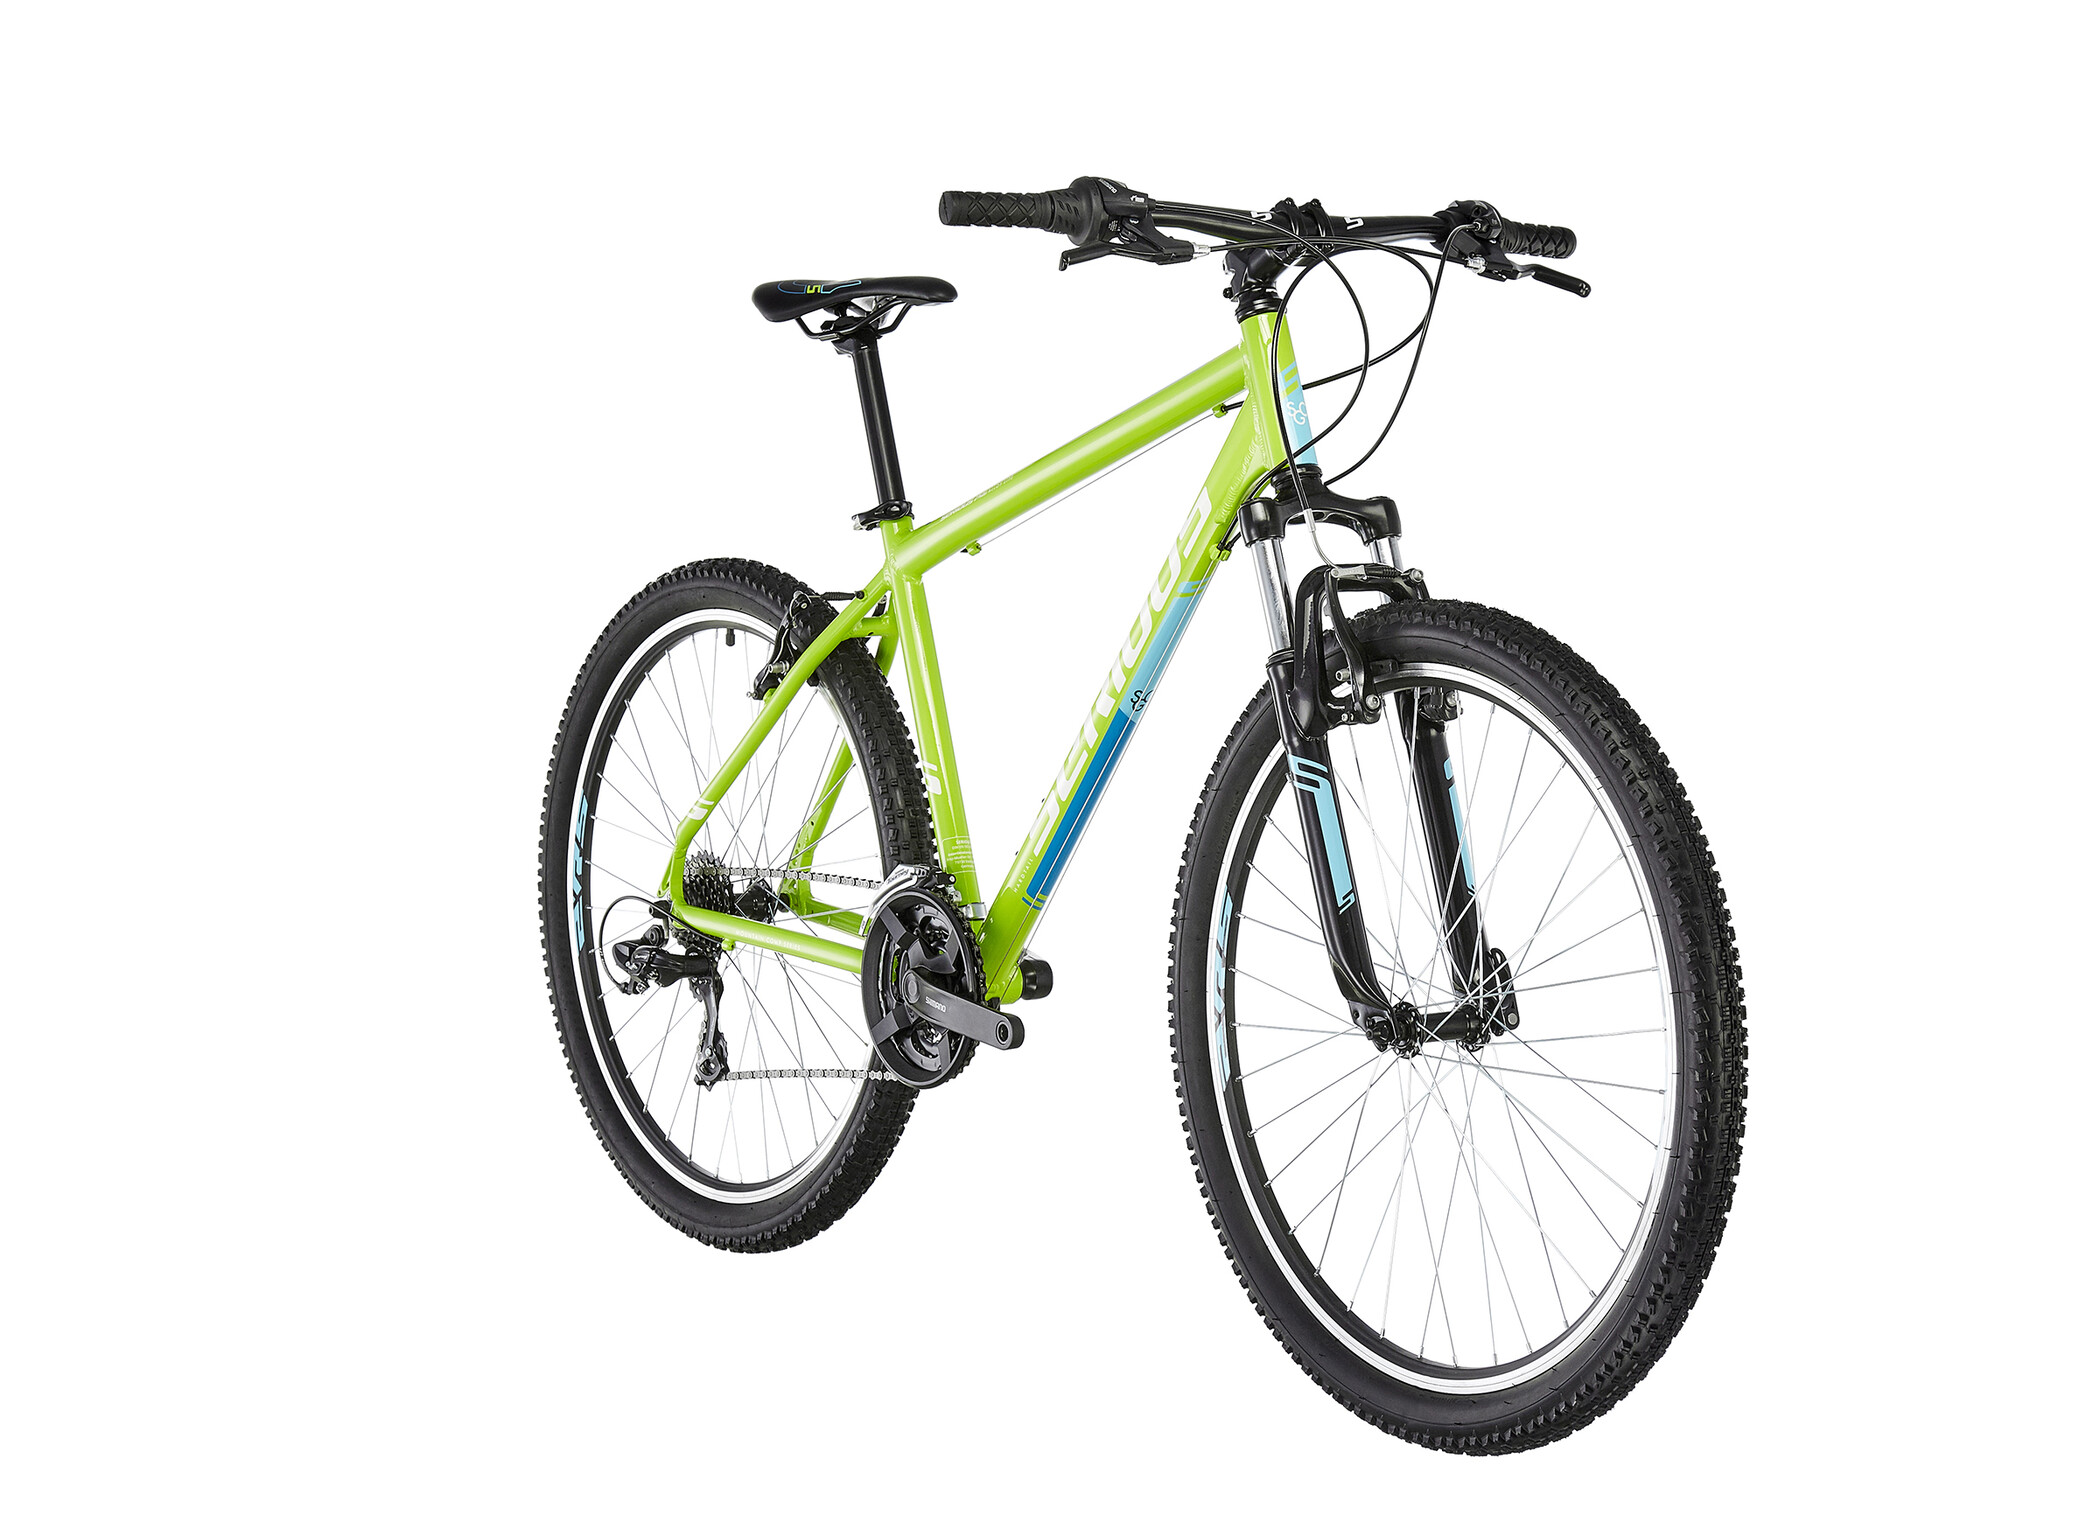 Serious Rockville 27,5'', green | Mountainbikes